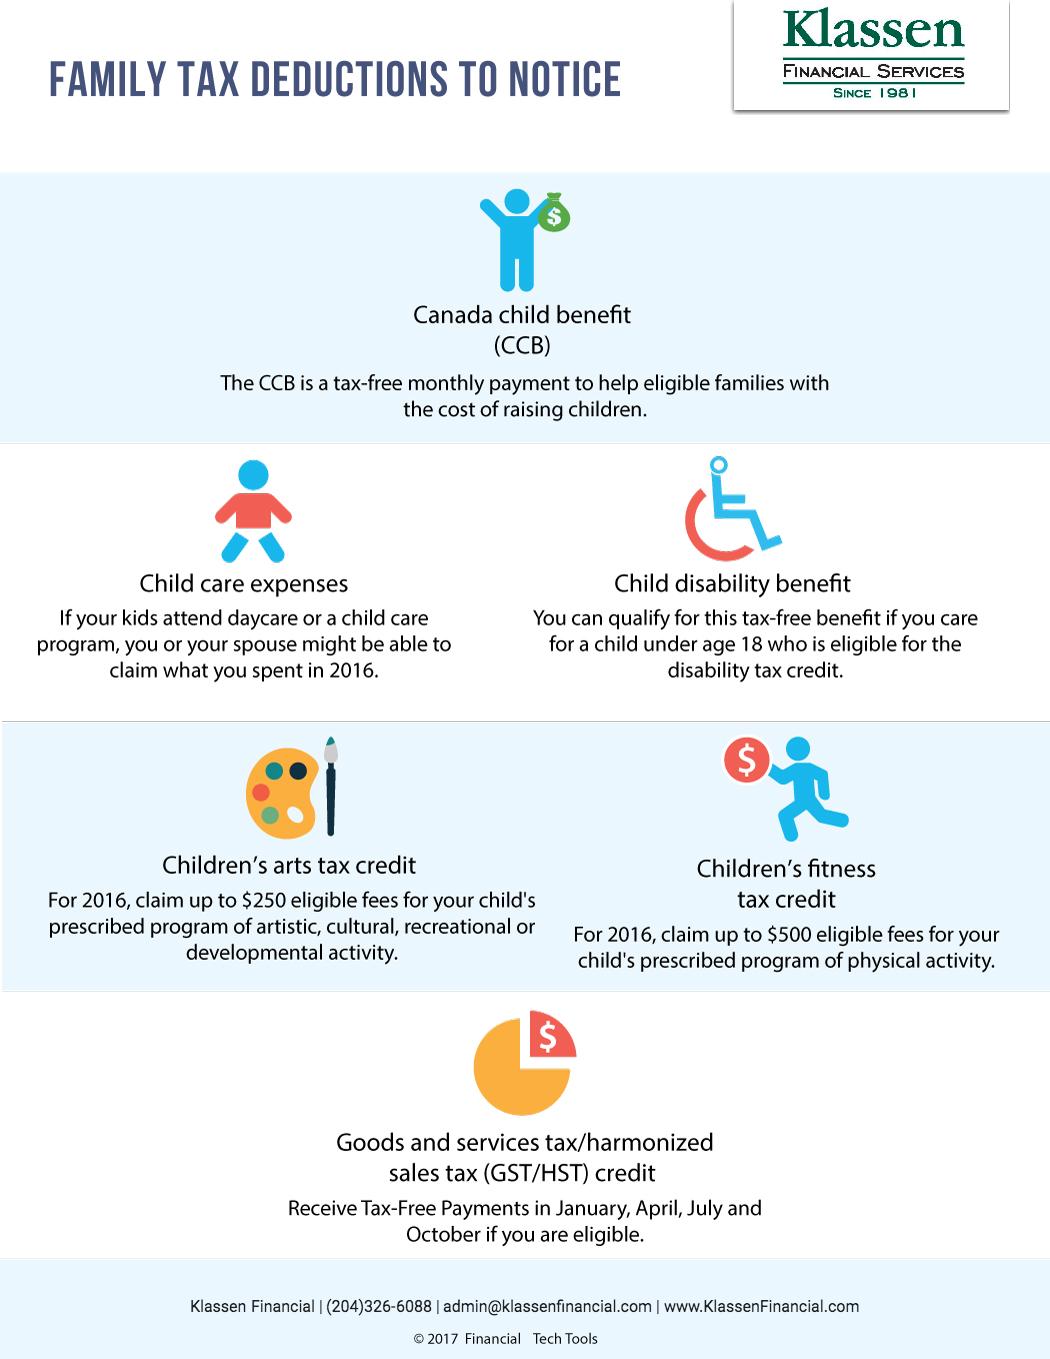 Medical Services Plan Premiums - Klassen Financial